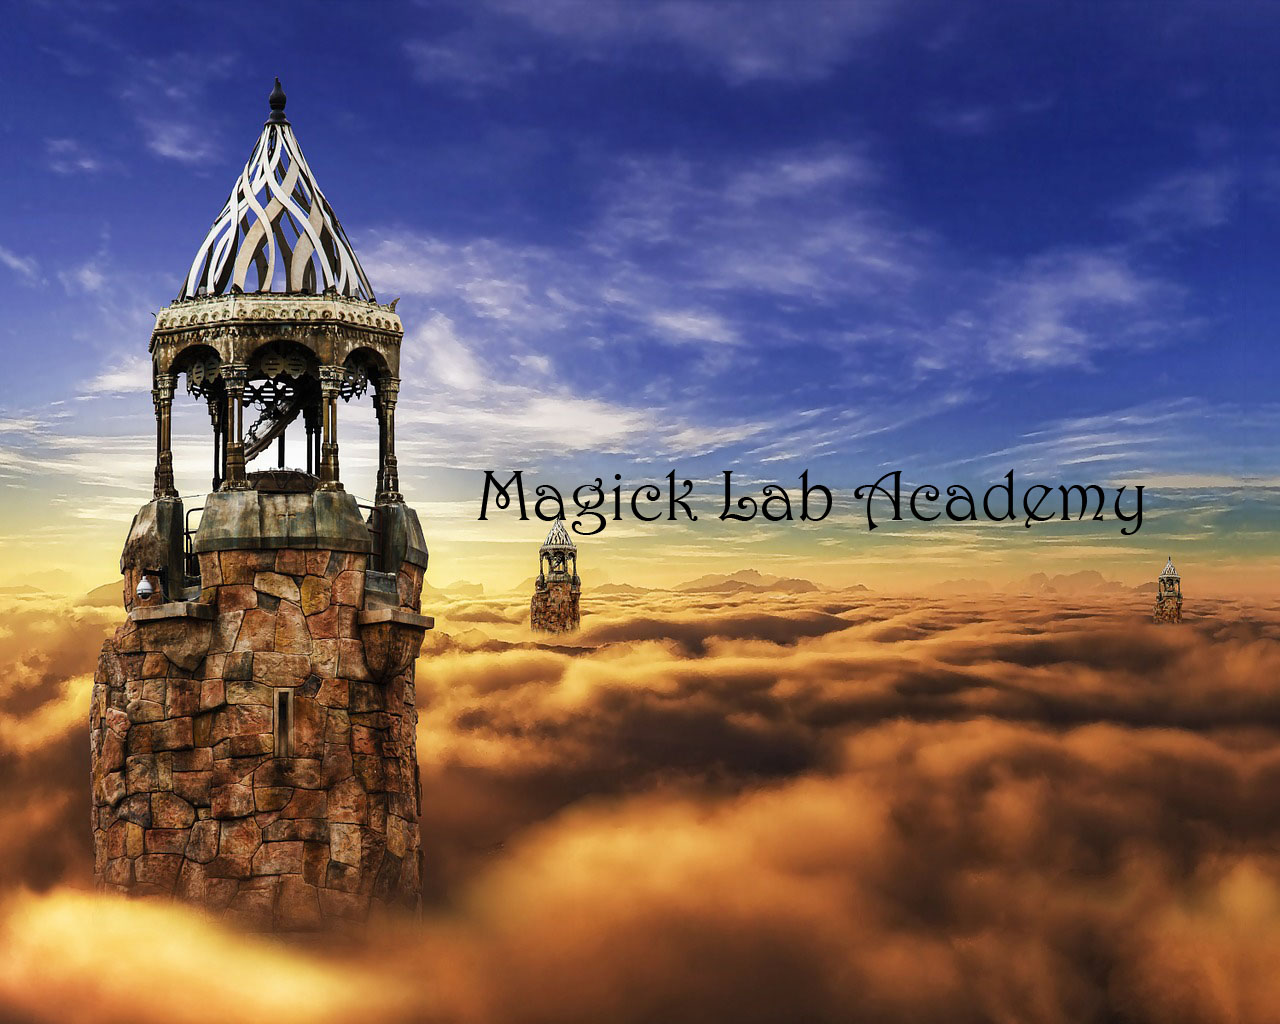 MagicLabAcademy.jpg